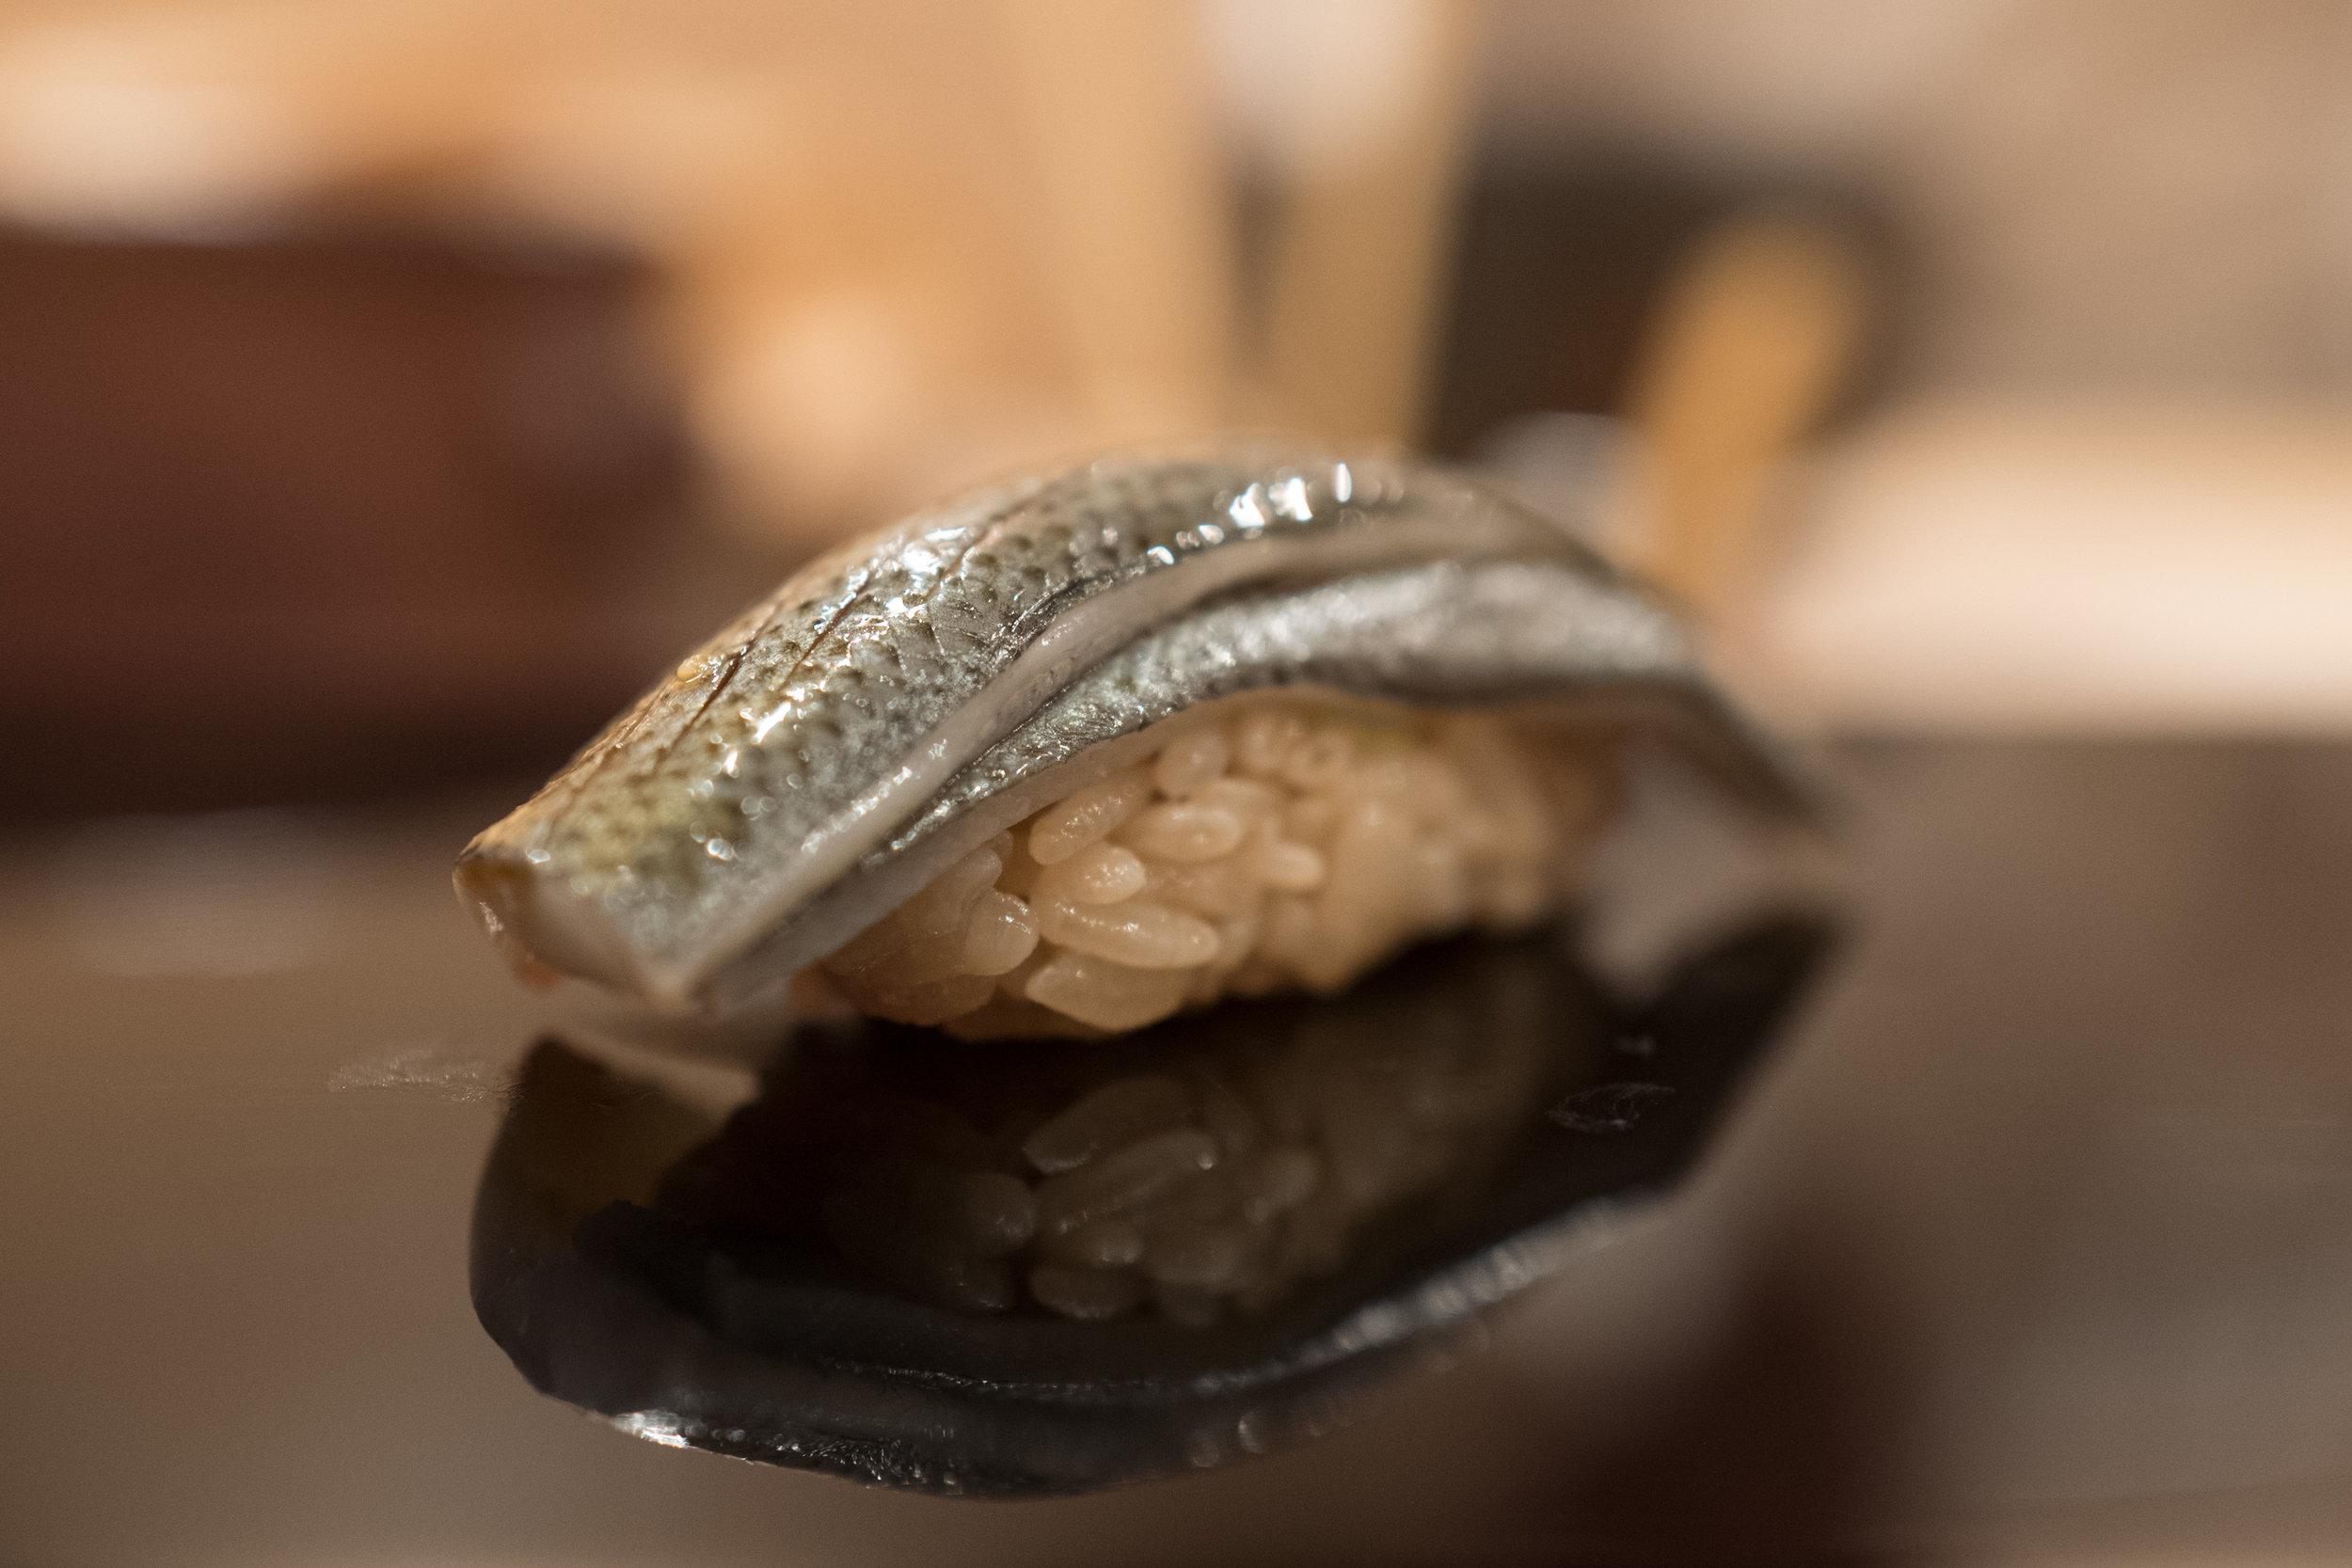 A really delicious kohada - Keita's shari paired with this neta perfectly